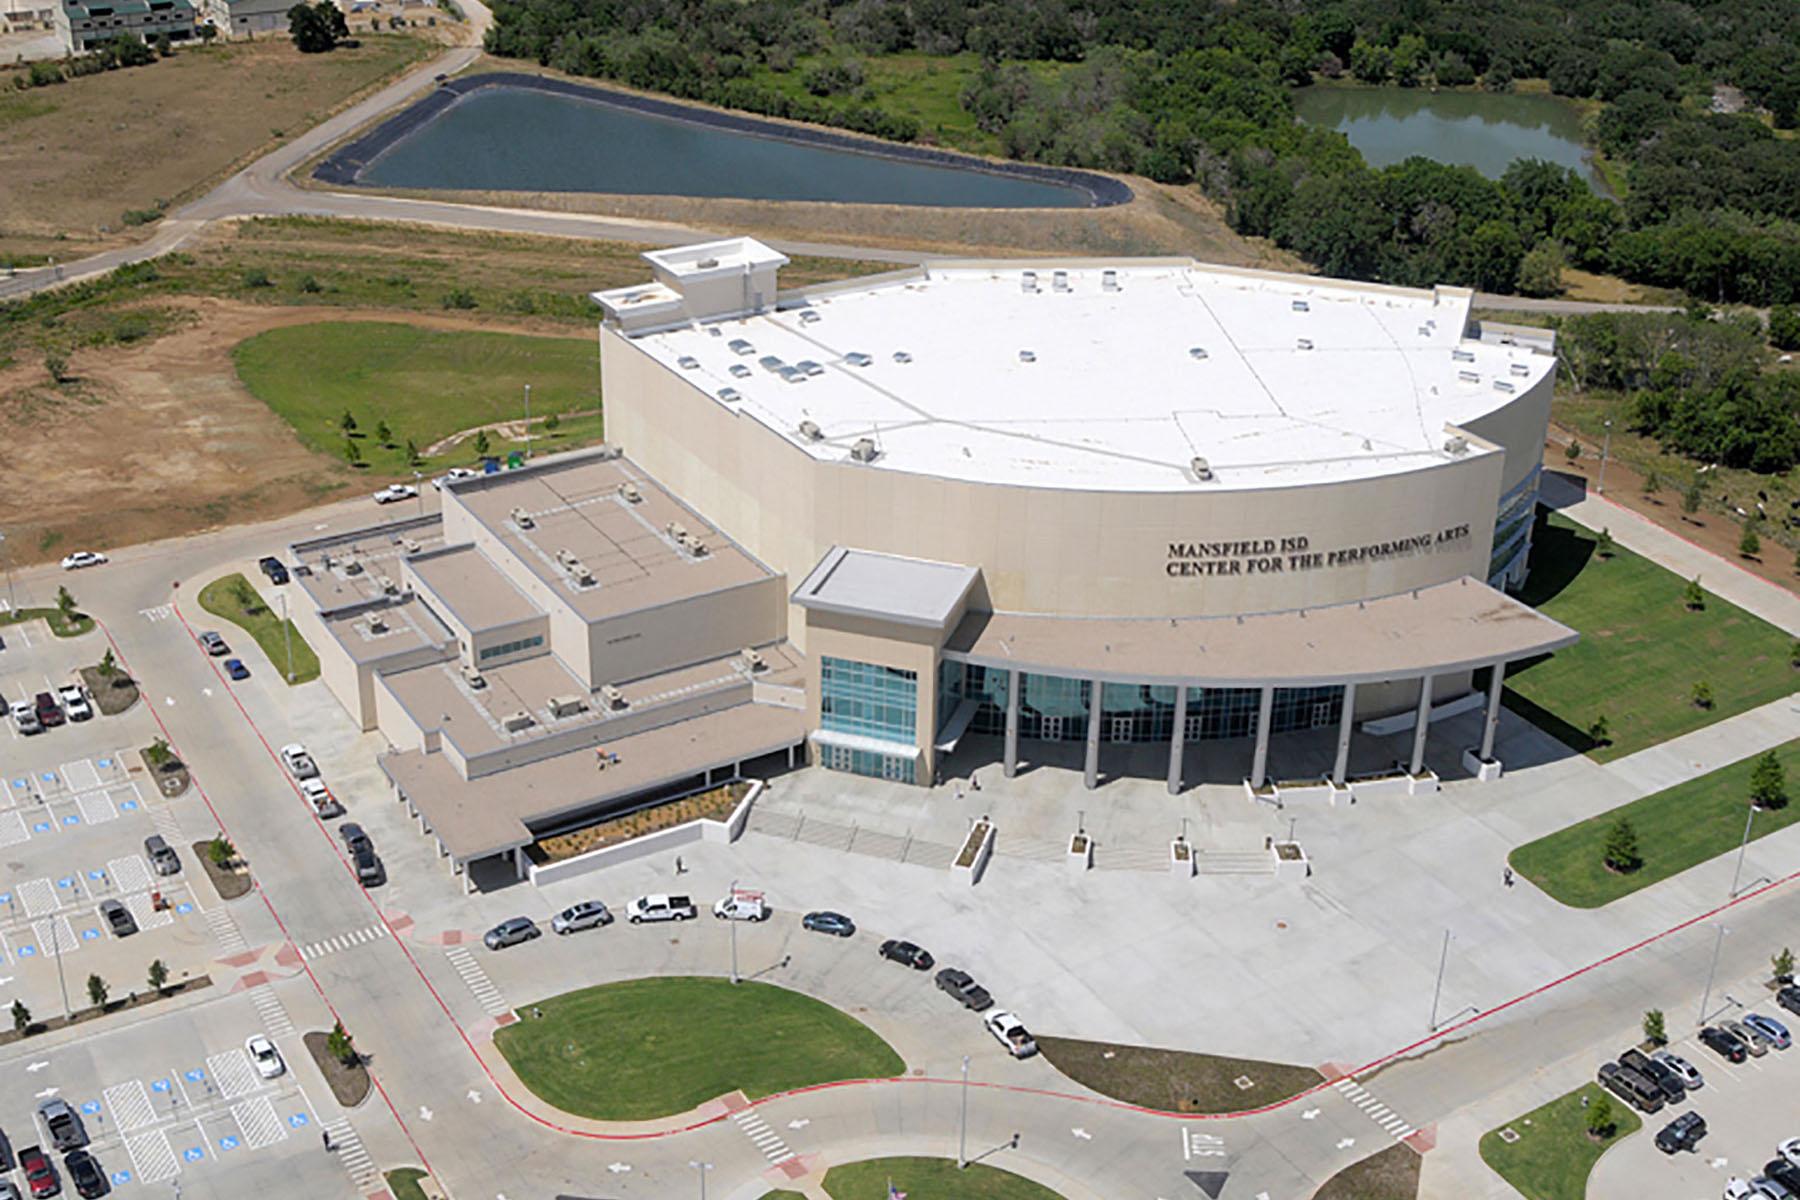 Mansfield Performing Arts Progressive Roofing